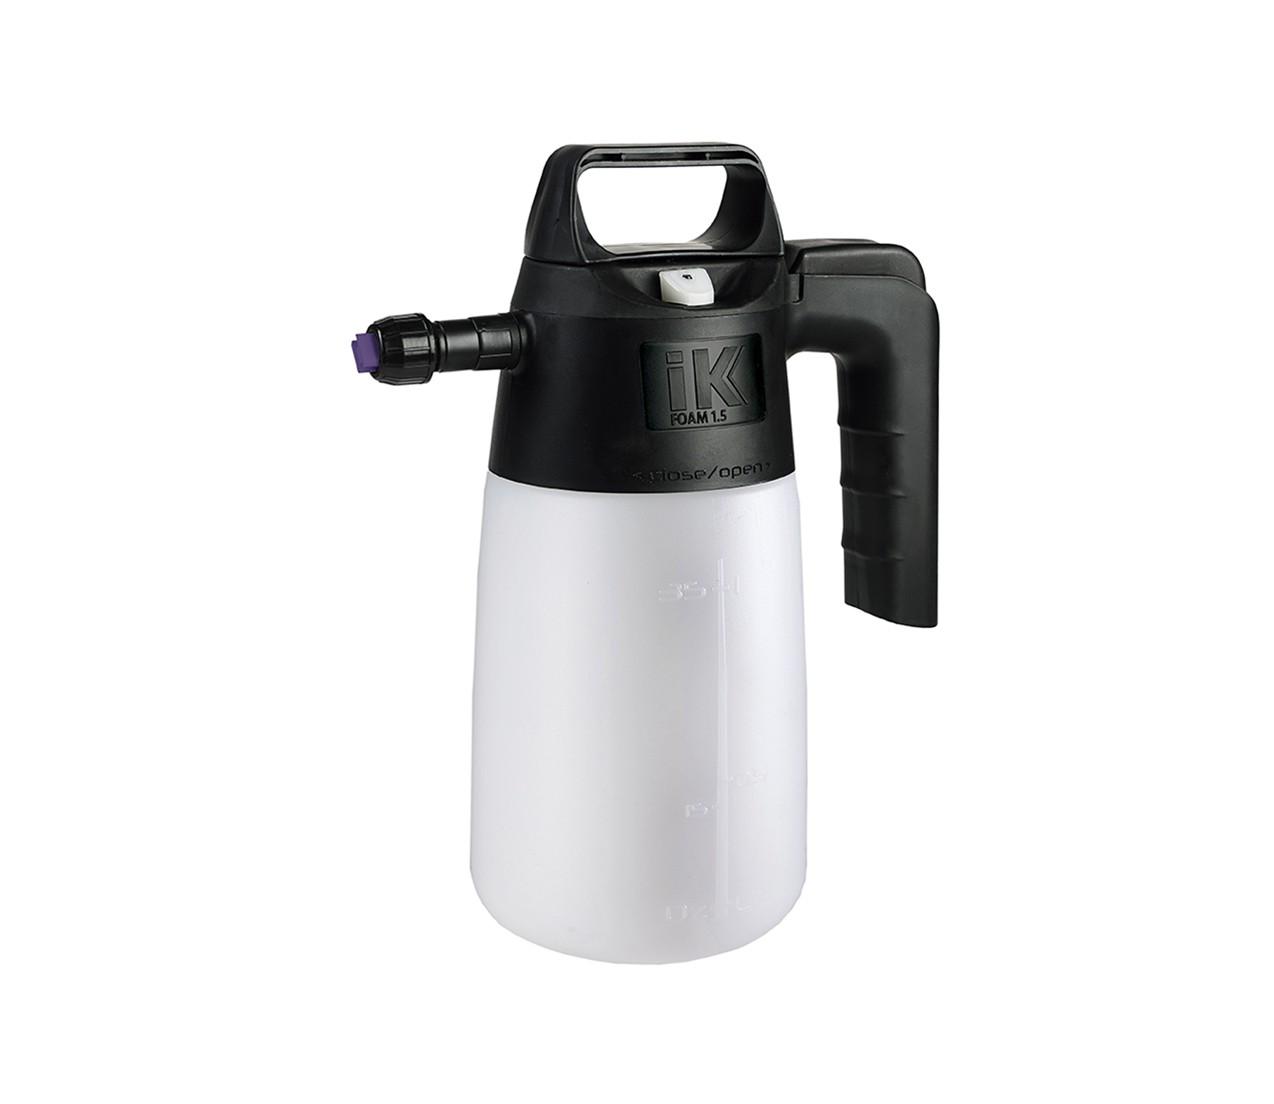 Pulverizador Compressão Prévia FOAM IK Foam 1.5